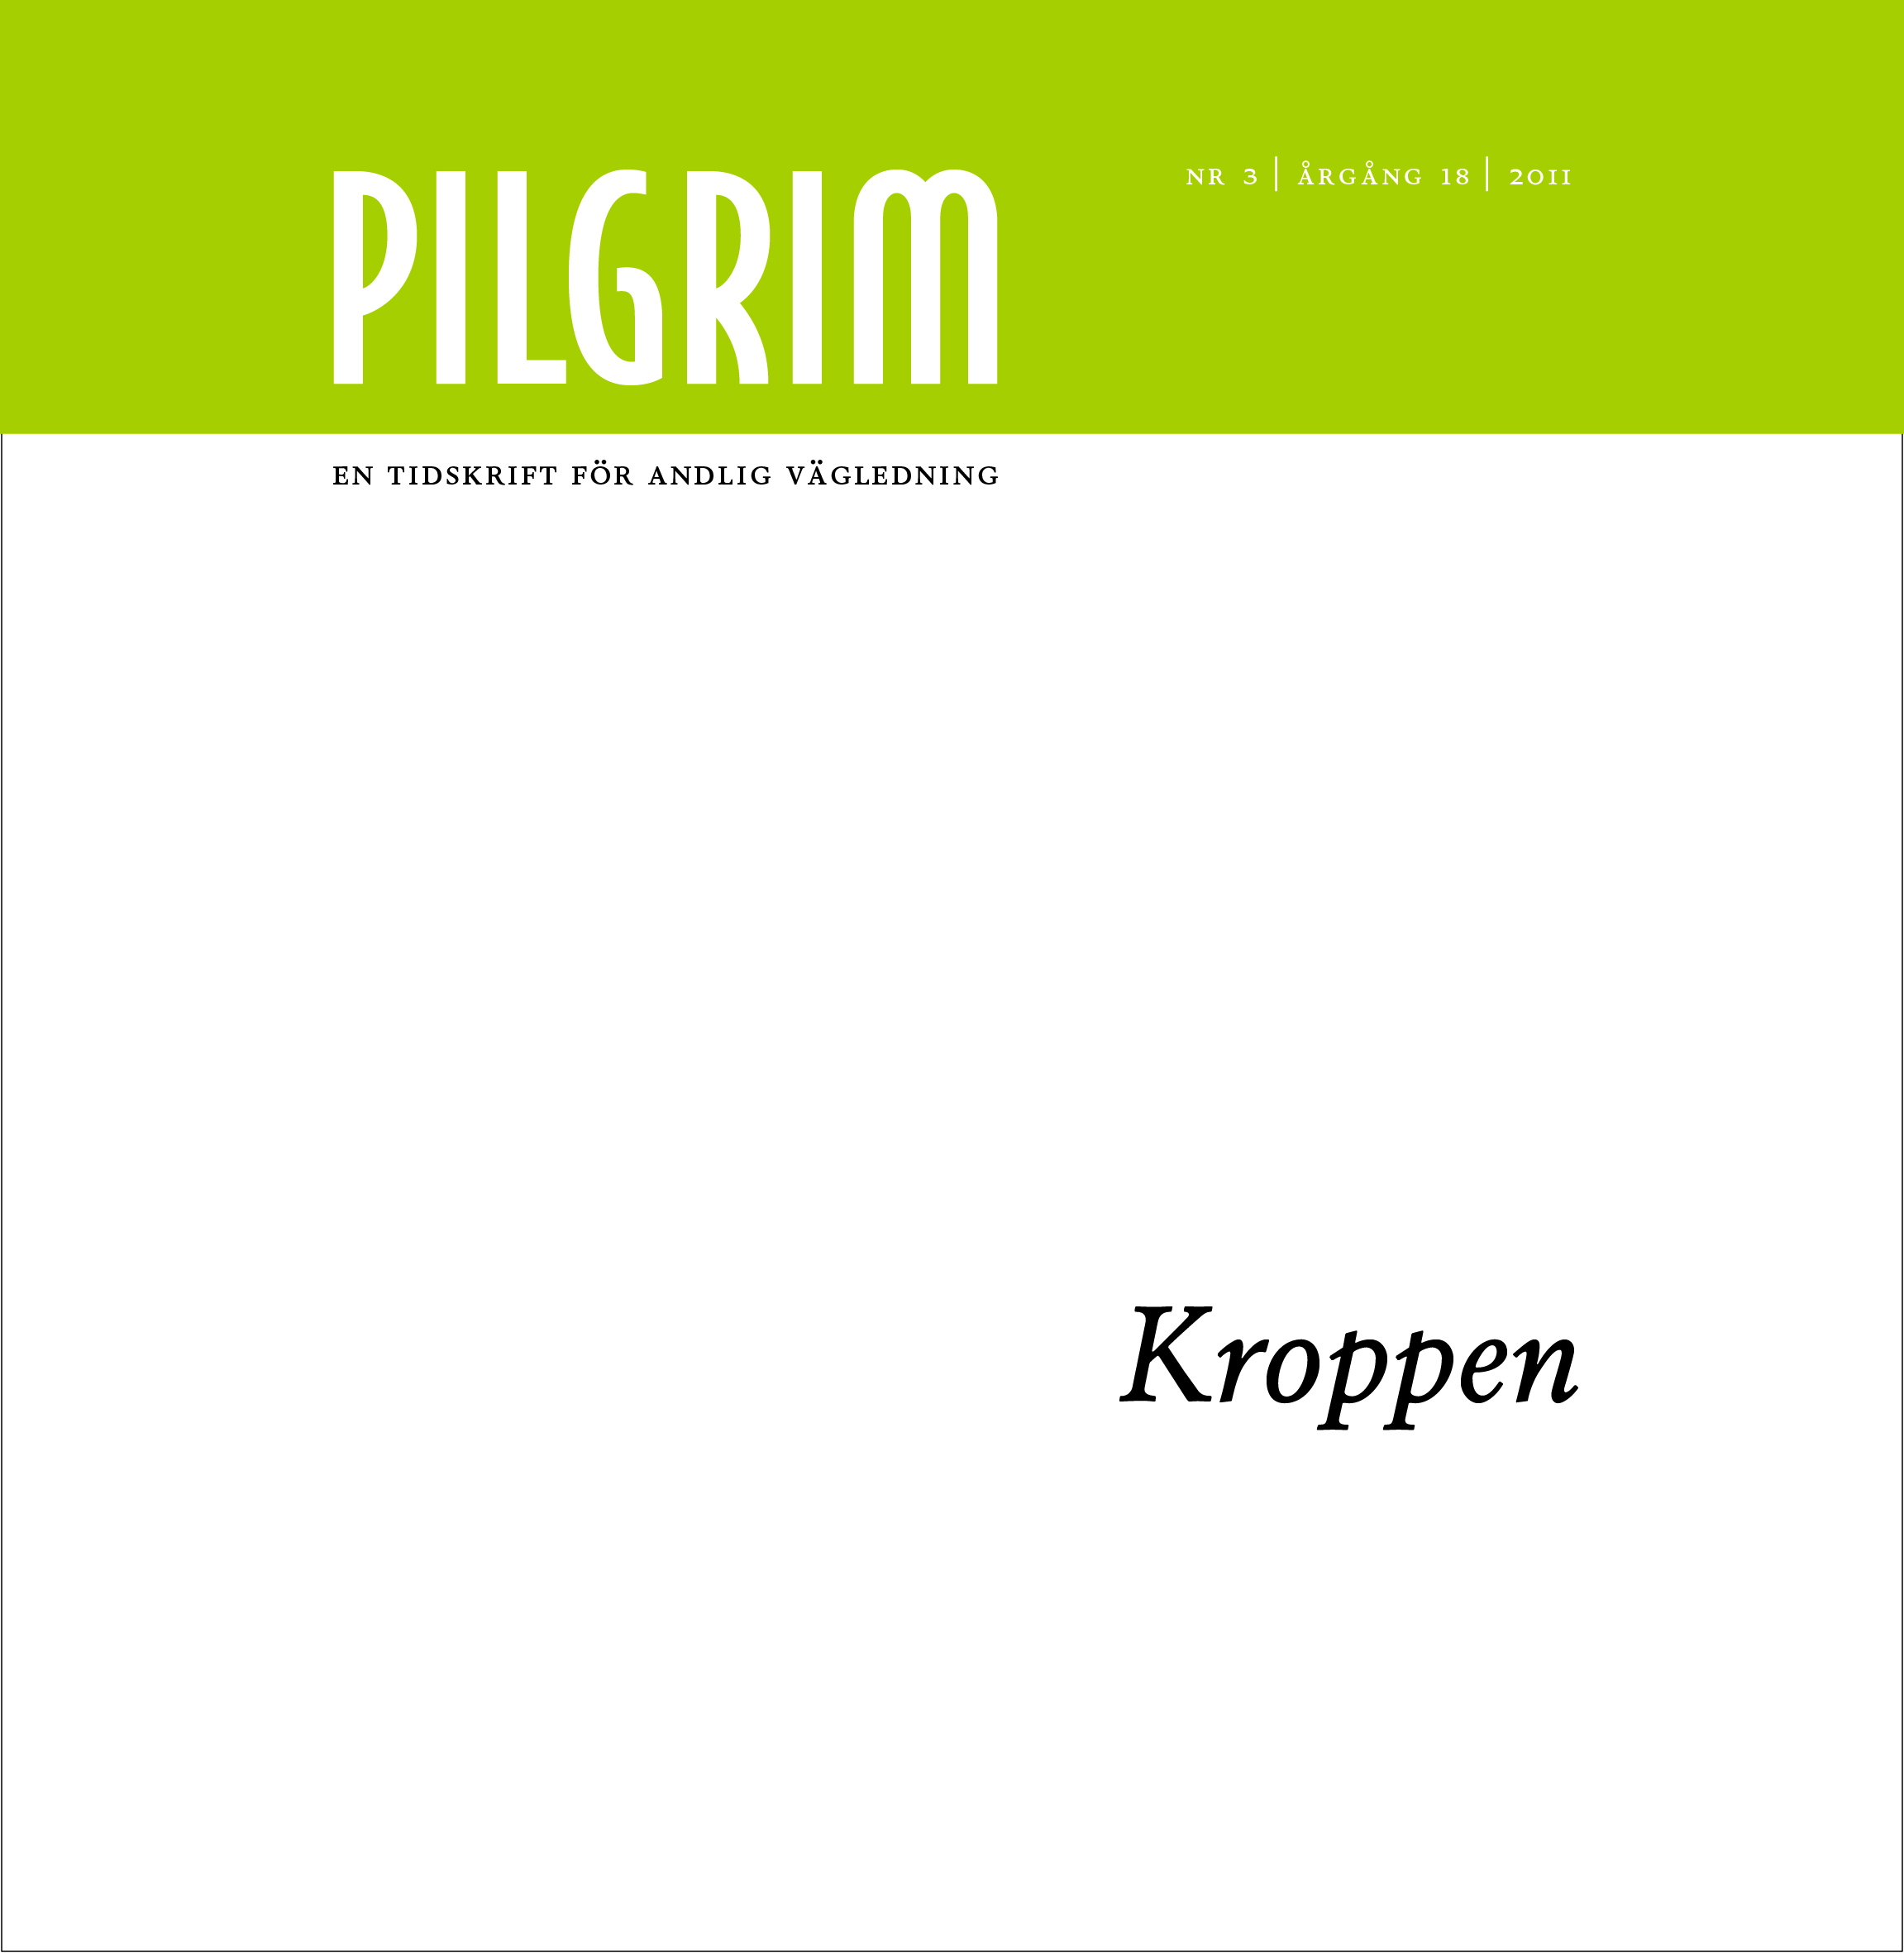 Pilgrim frams 2011-3